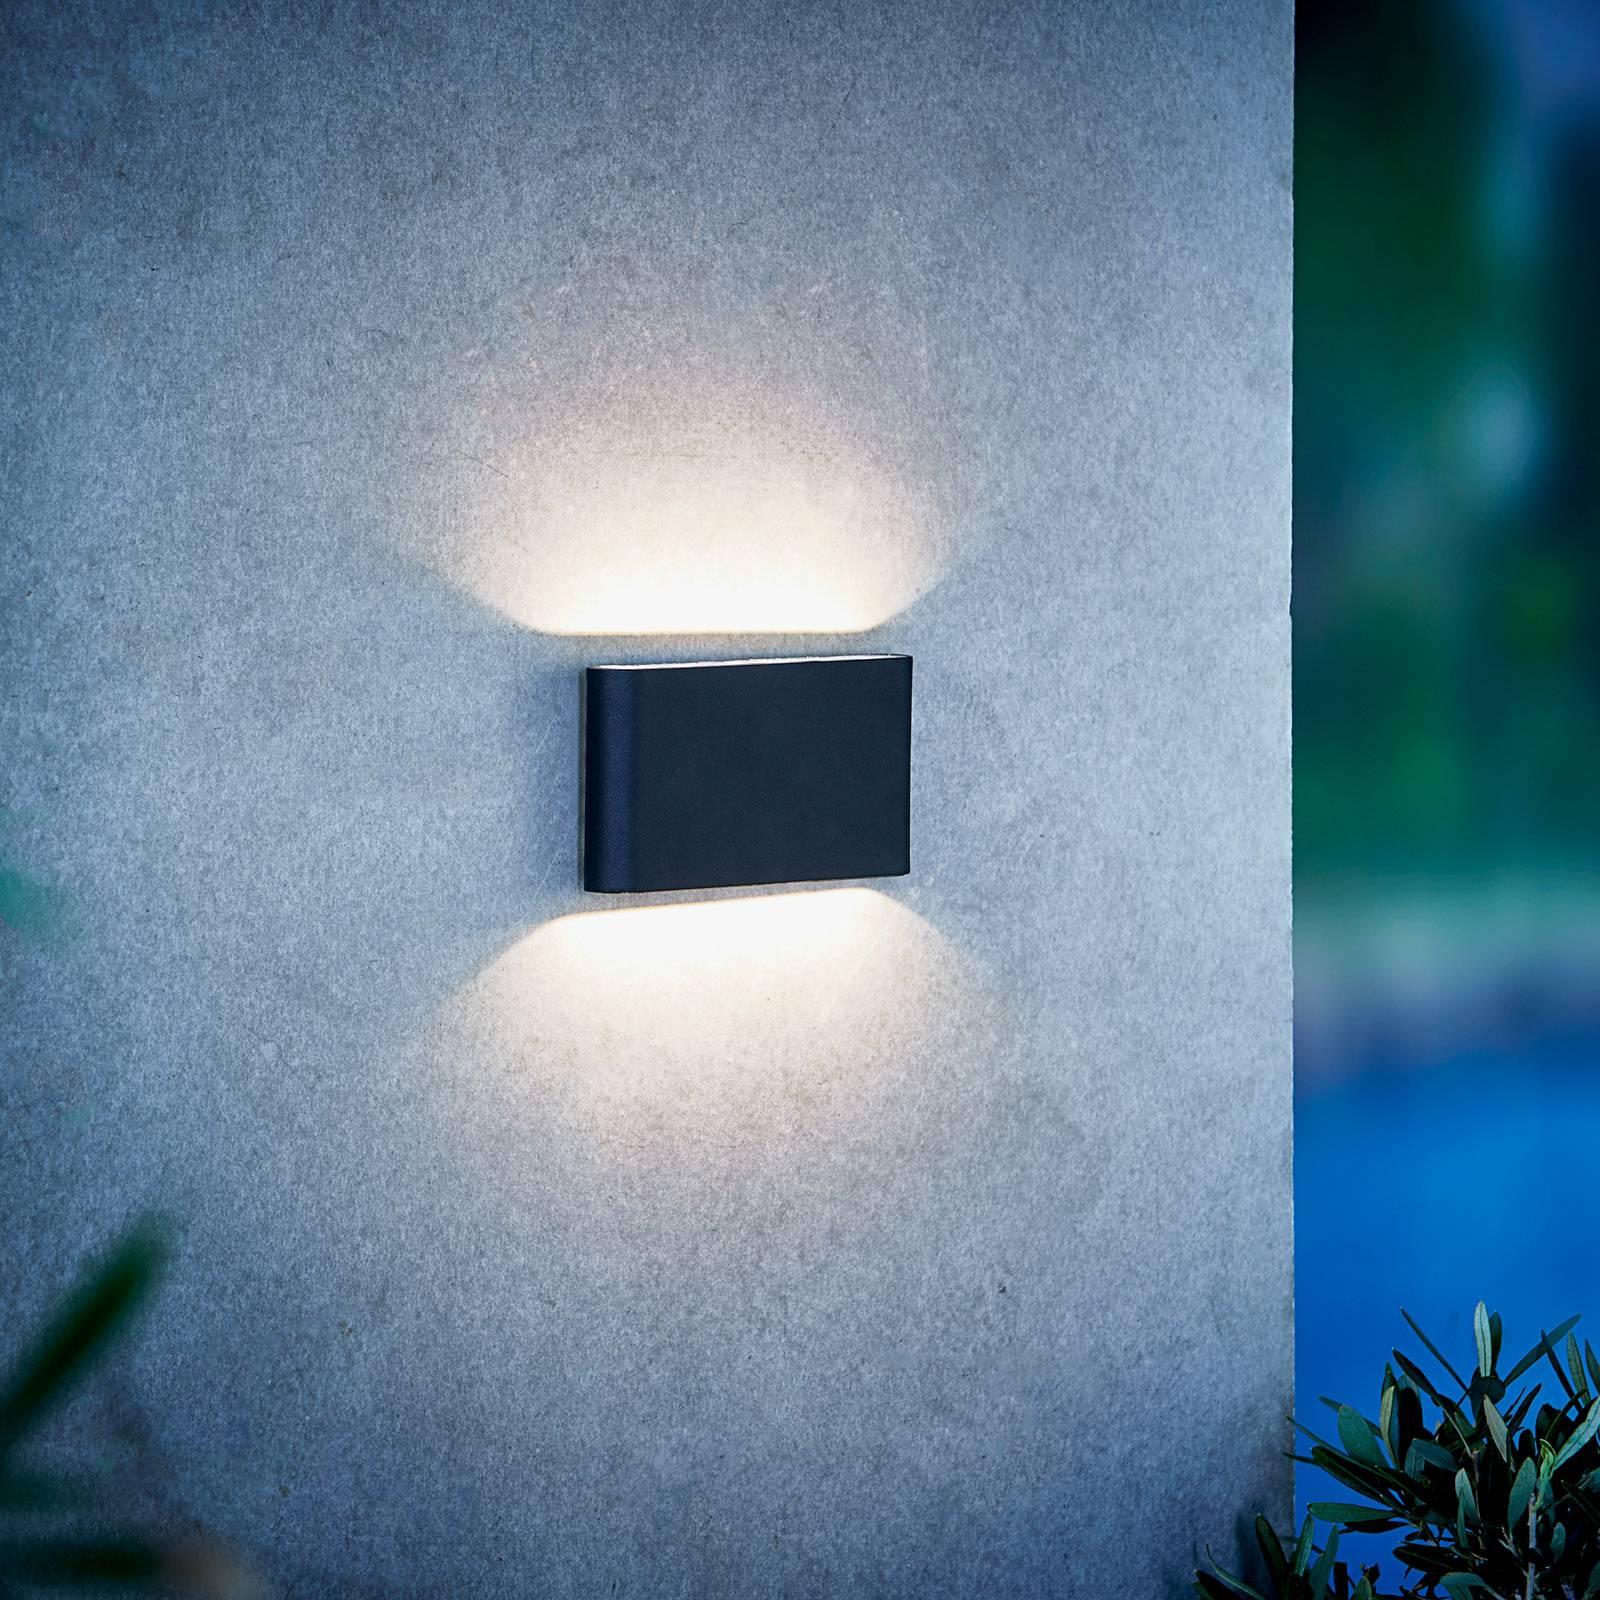 LED-ulkoseinälamppu Kinver, ohut muotoilu, musta